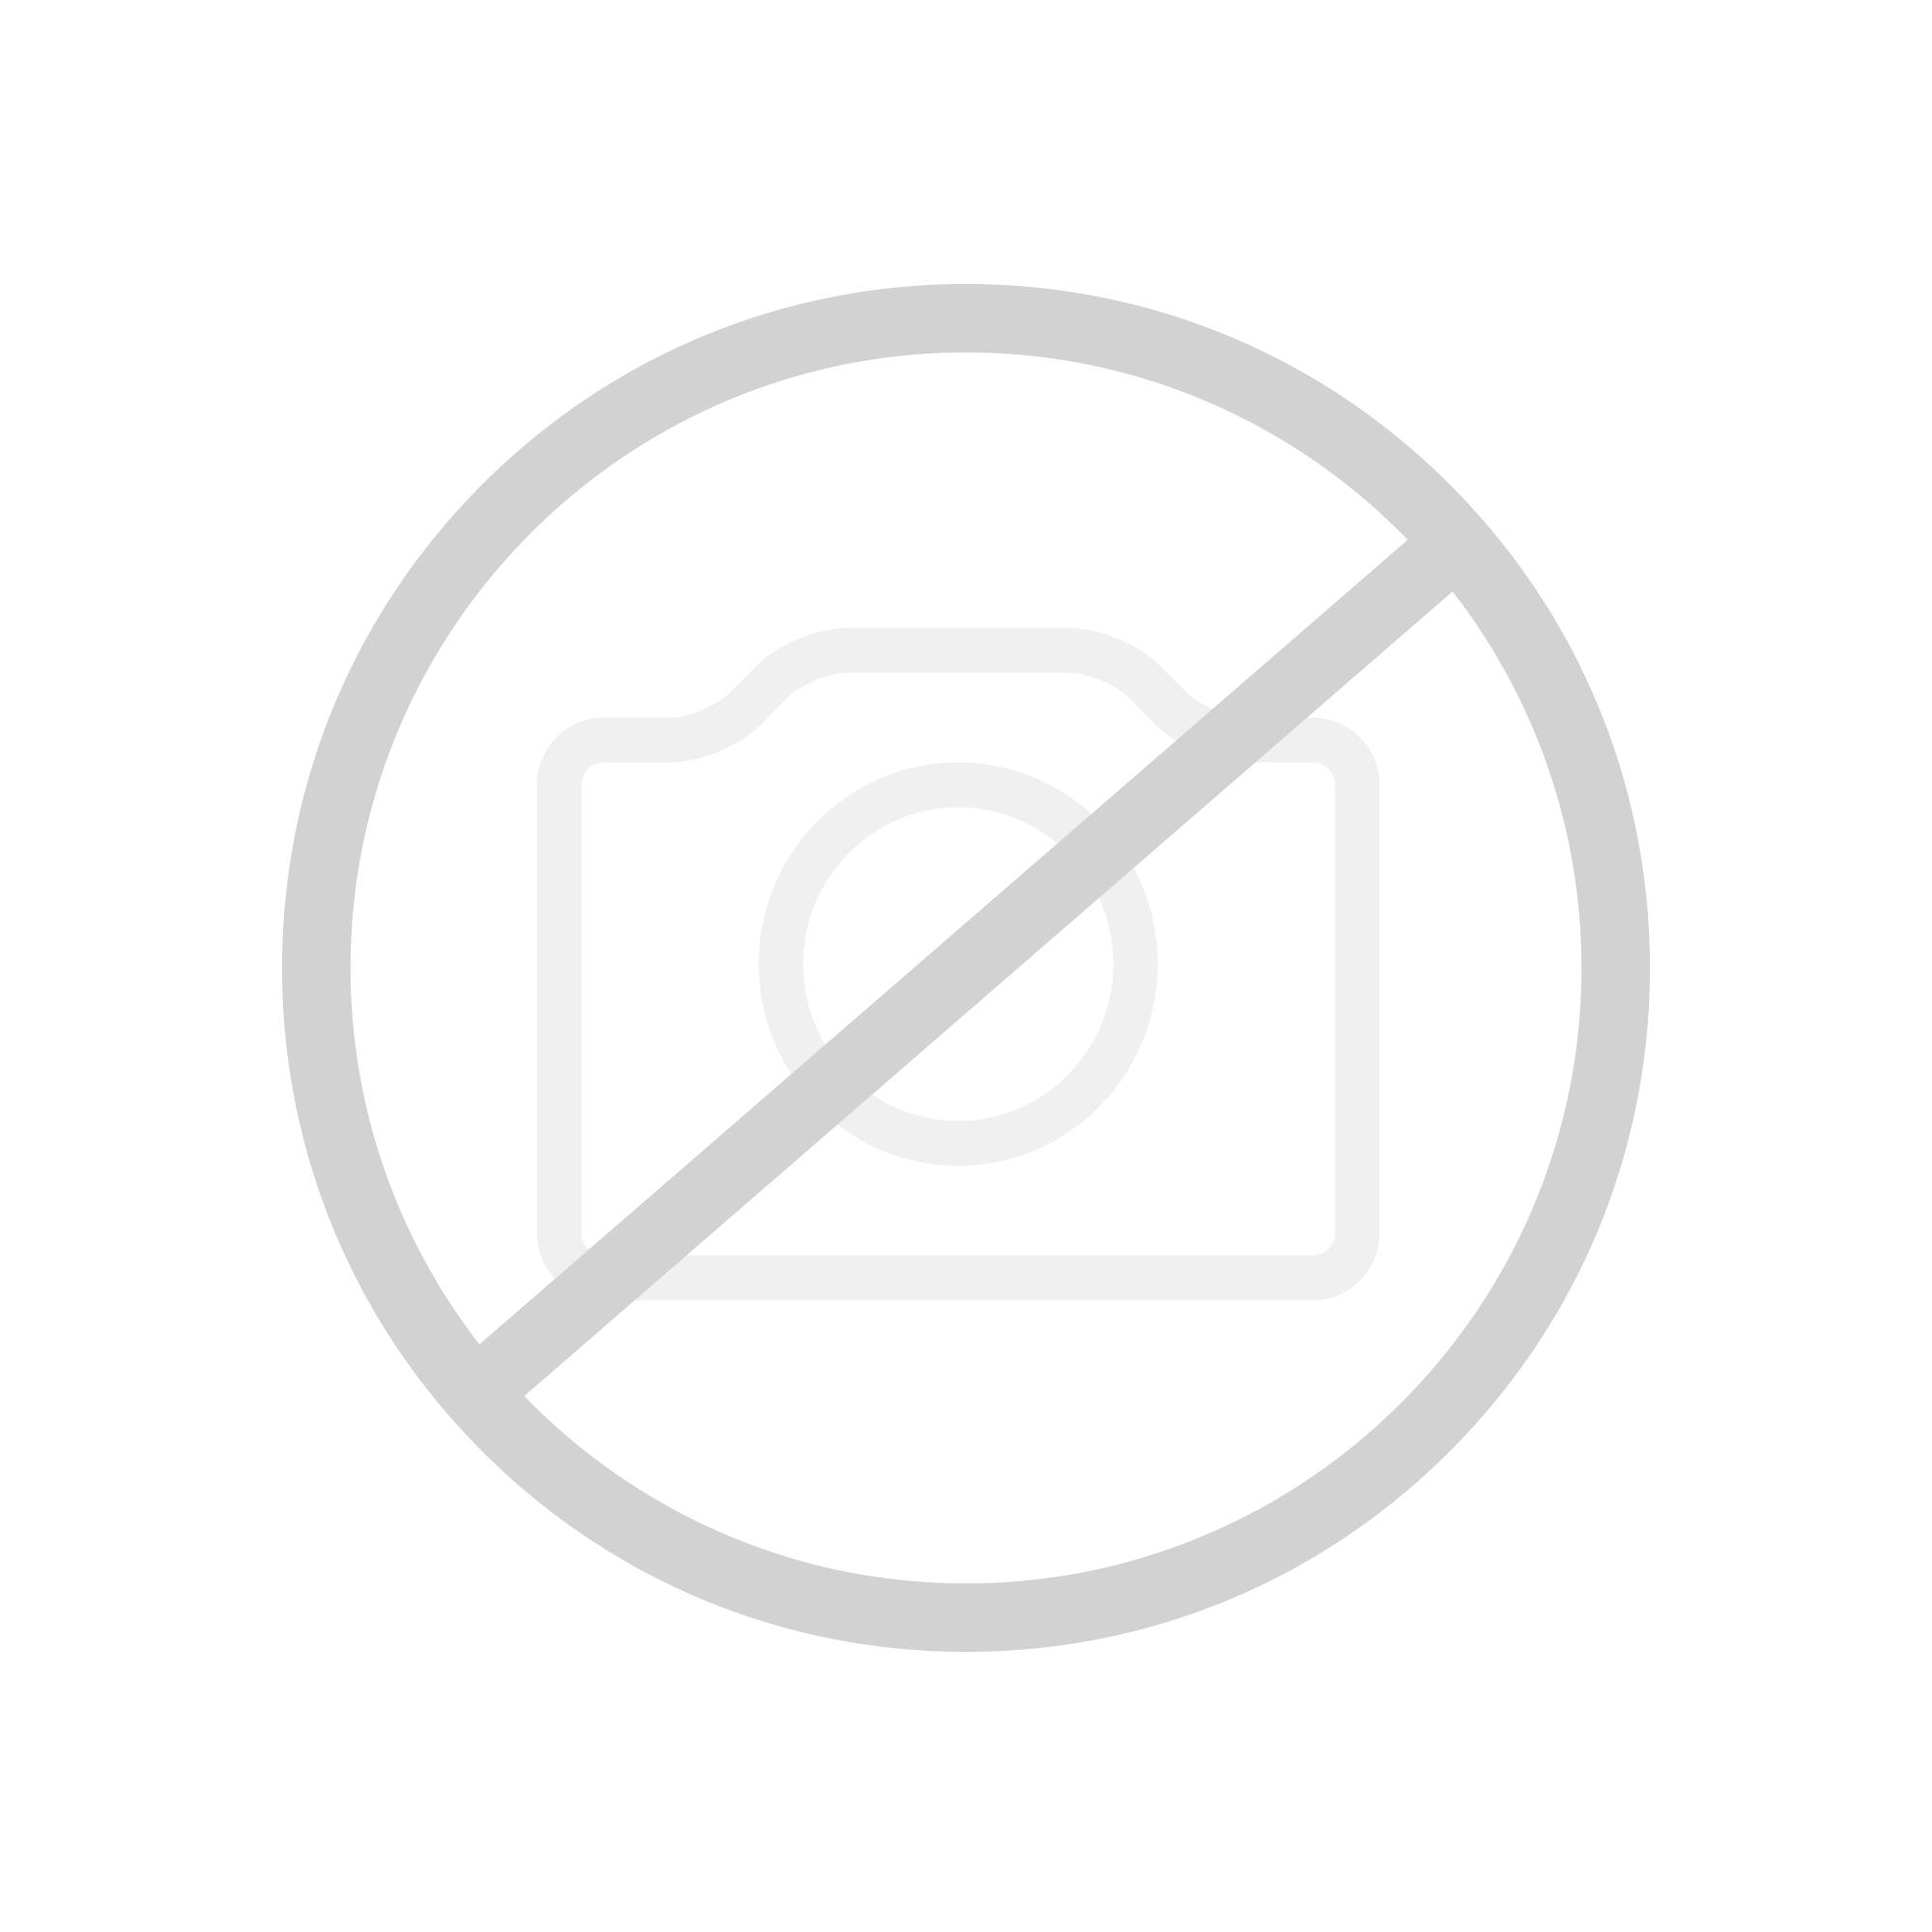 grohe rapid sl montageelement f r urinal ohne armatur 38517001 reuter onlineshop. Black Bedroom Furniture Sets. Home Design Ideas